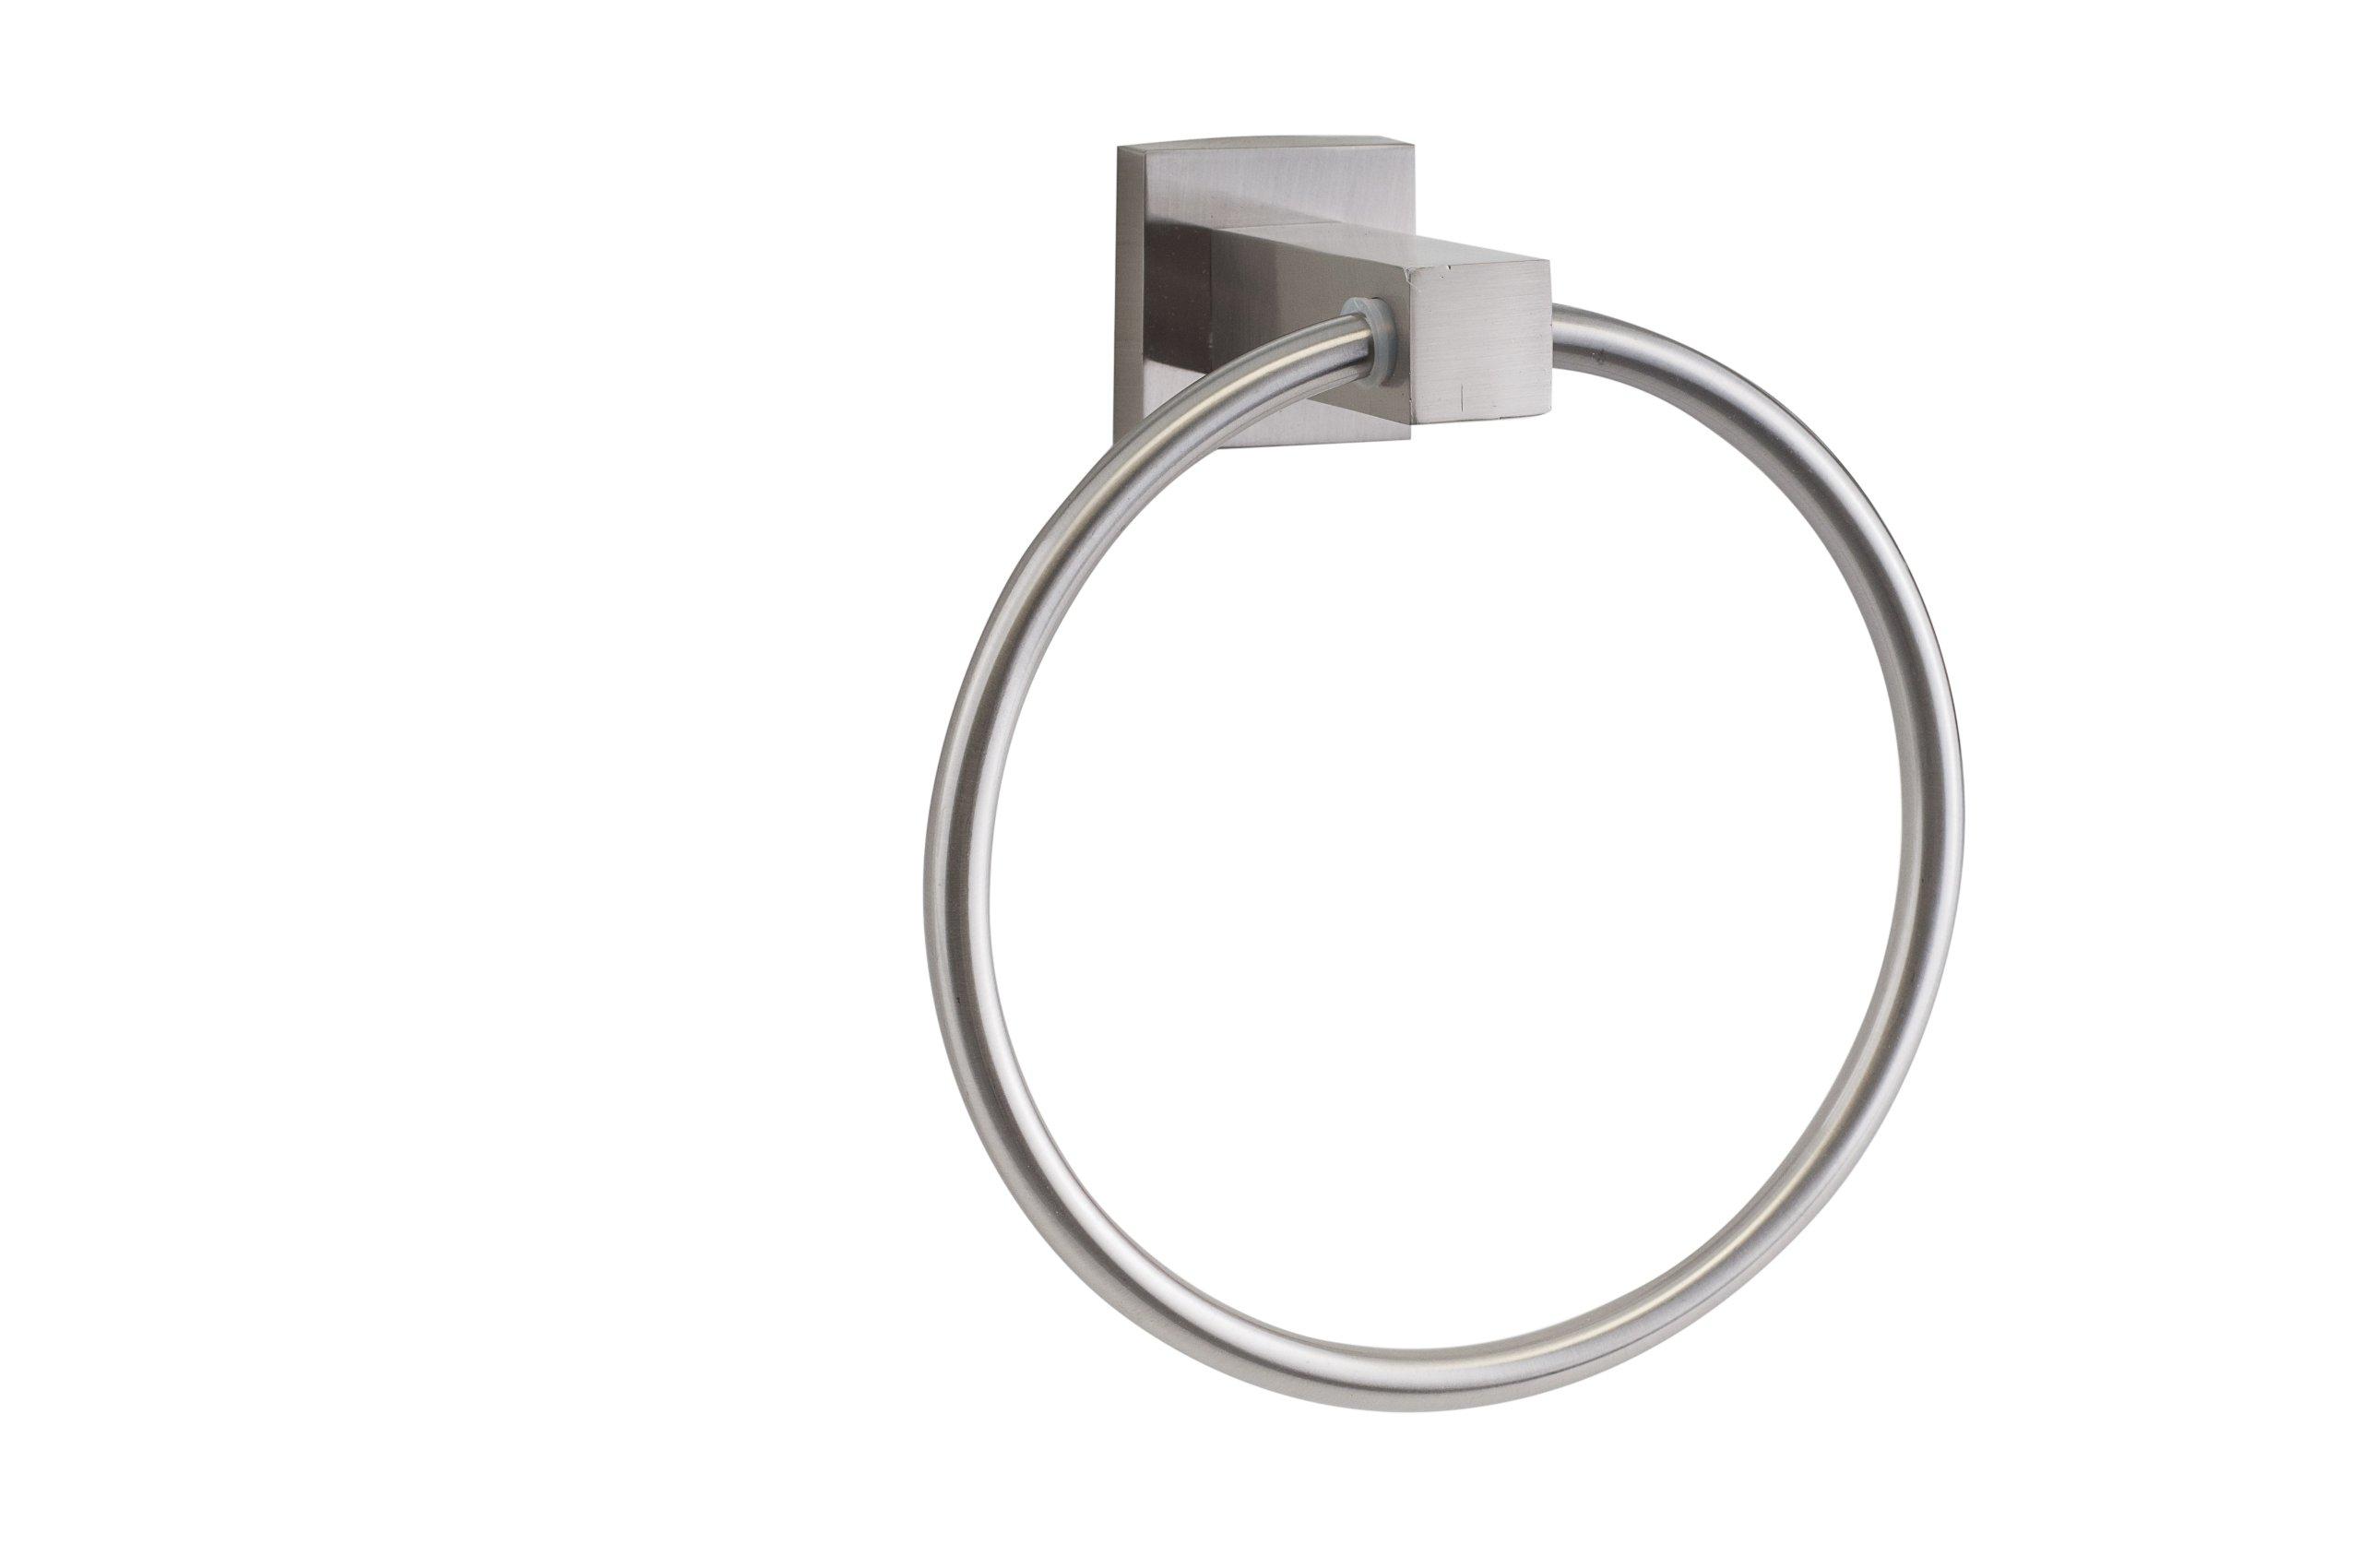 Sure-Loc Hardware BD-TR1 15 Baden Towel Ring by Sure-Loc Hardware